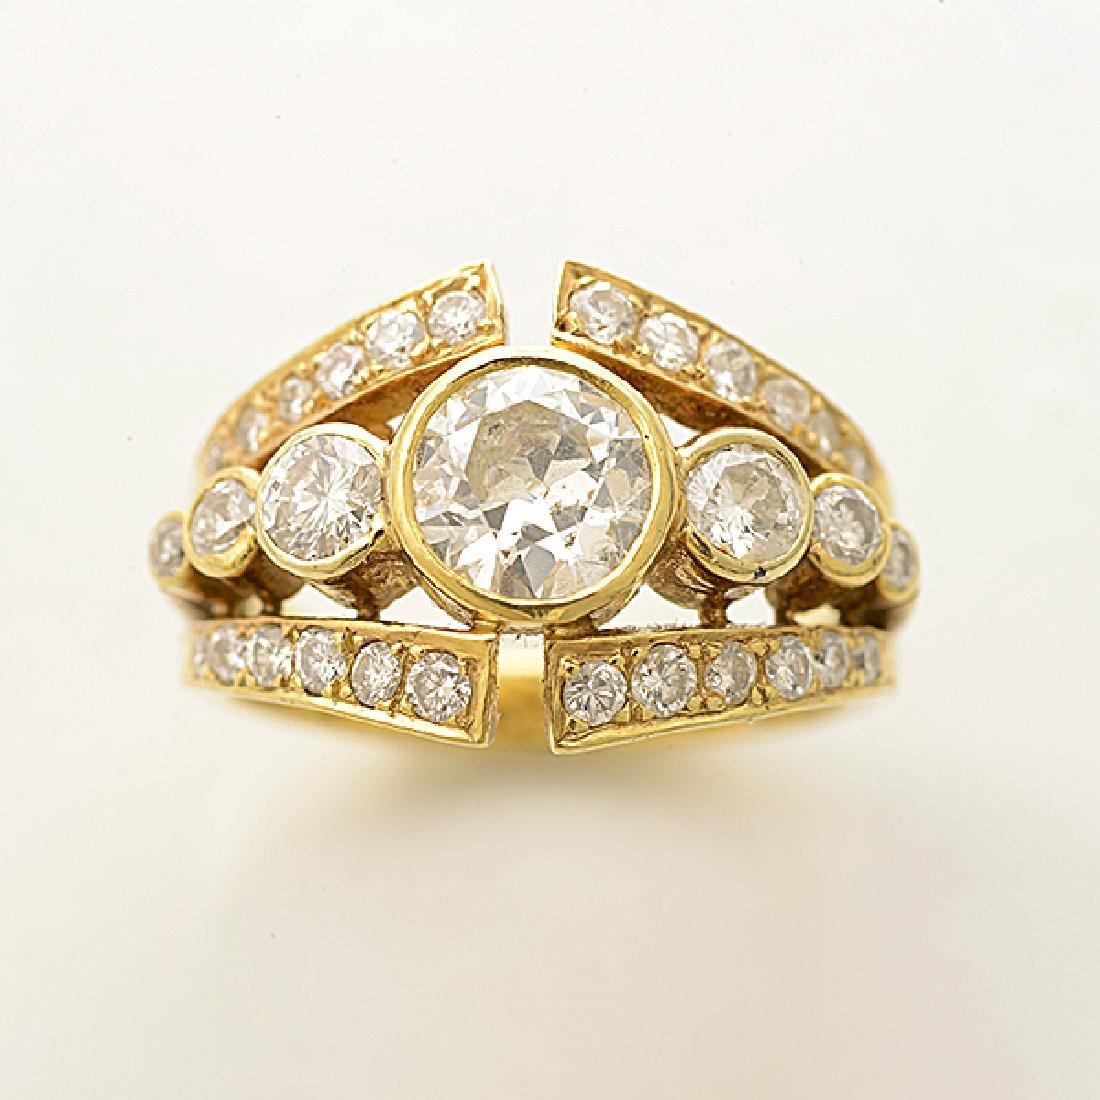 Diamond, 18k Yellow Gold Ring. - 2